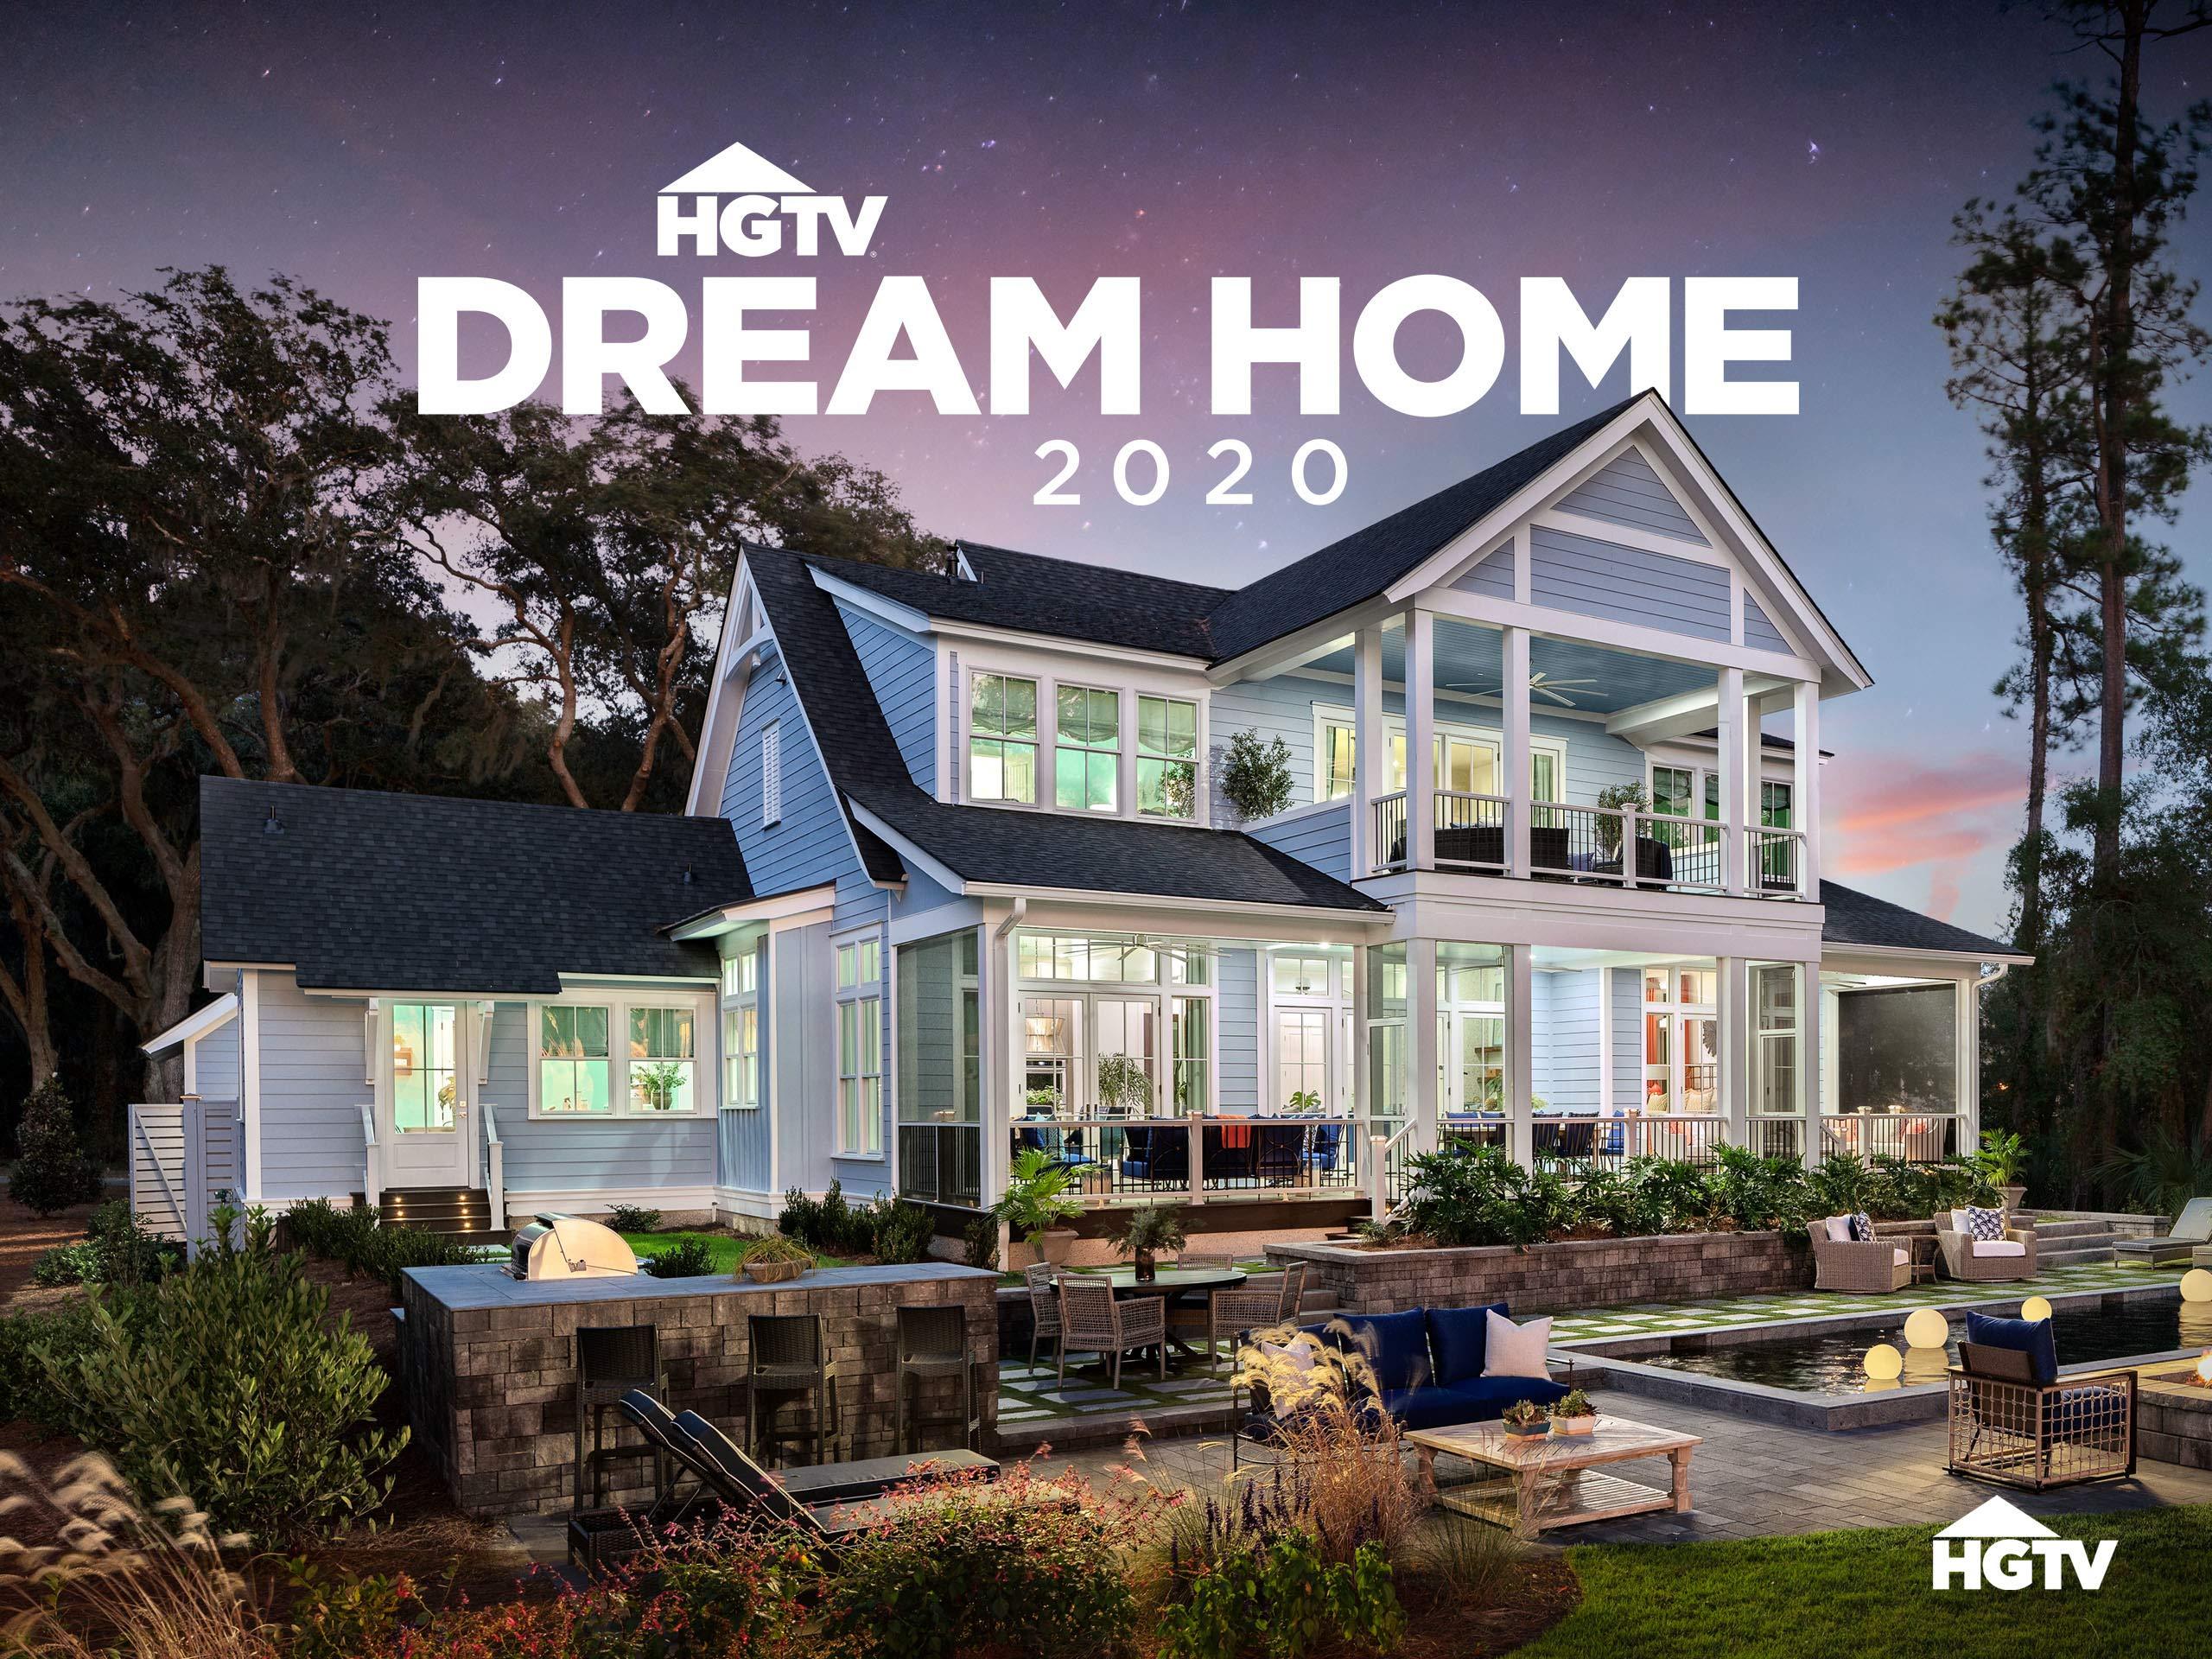 hgtv dream home 2020 hilton head sweepstakes